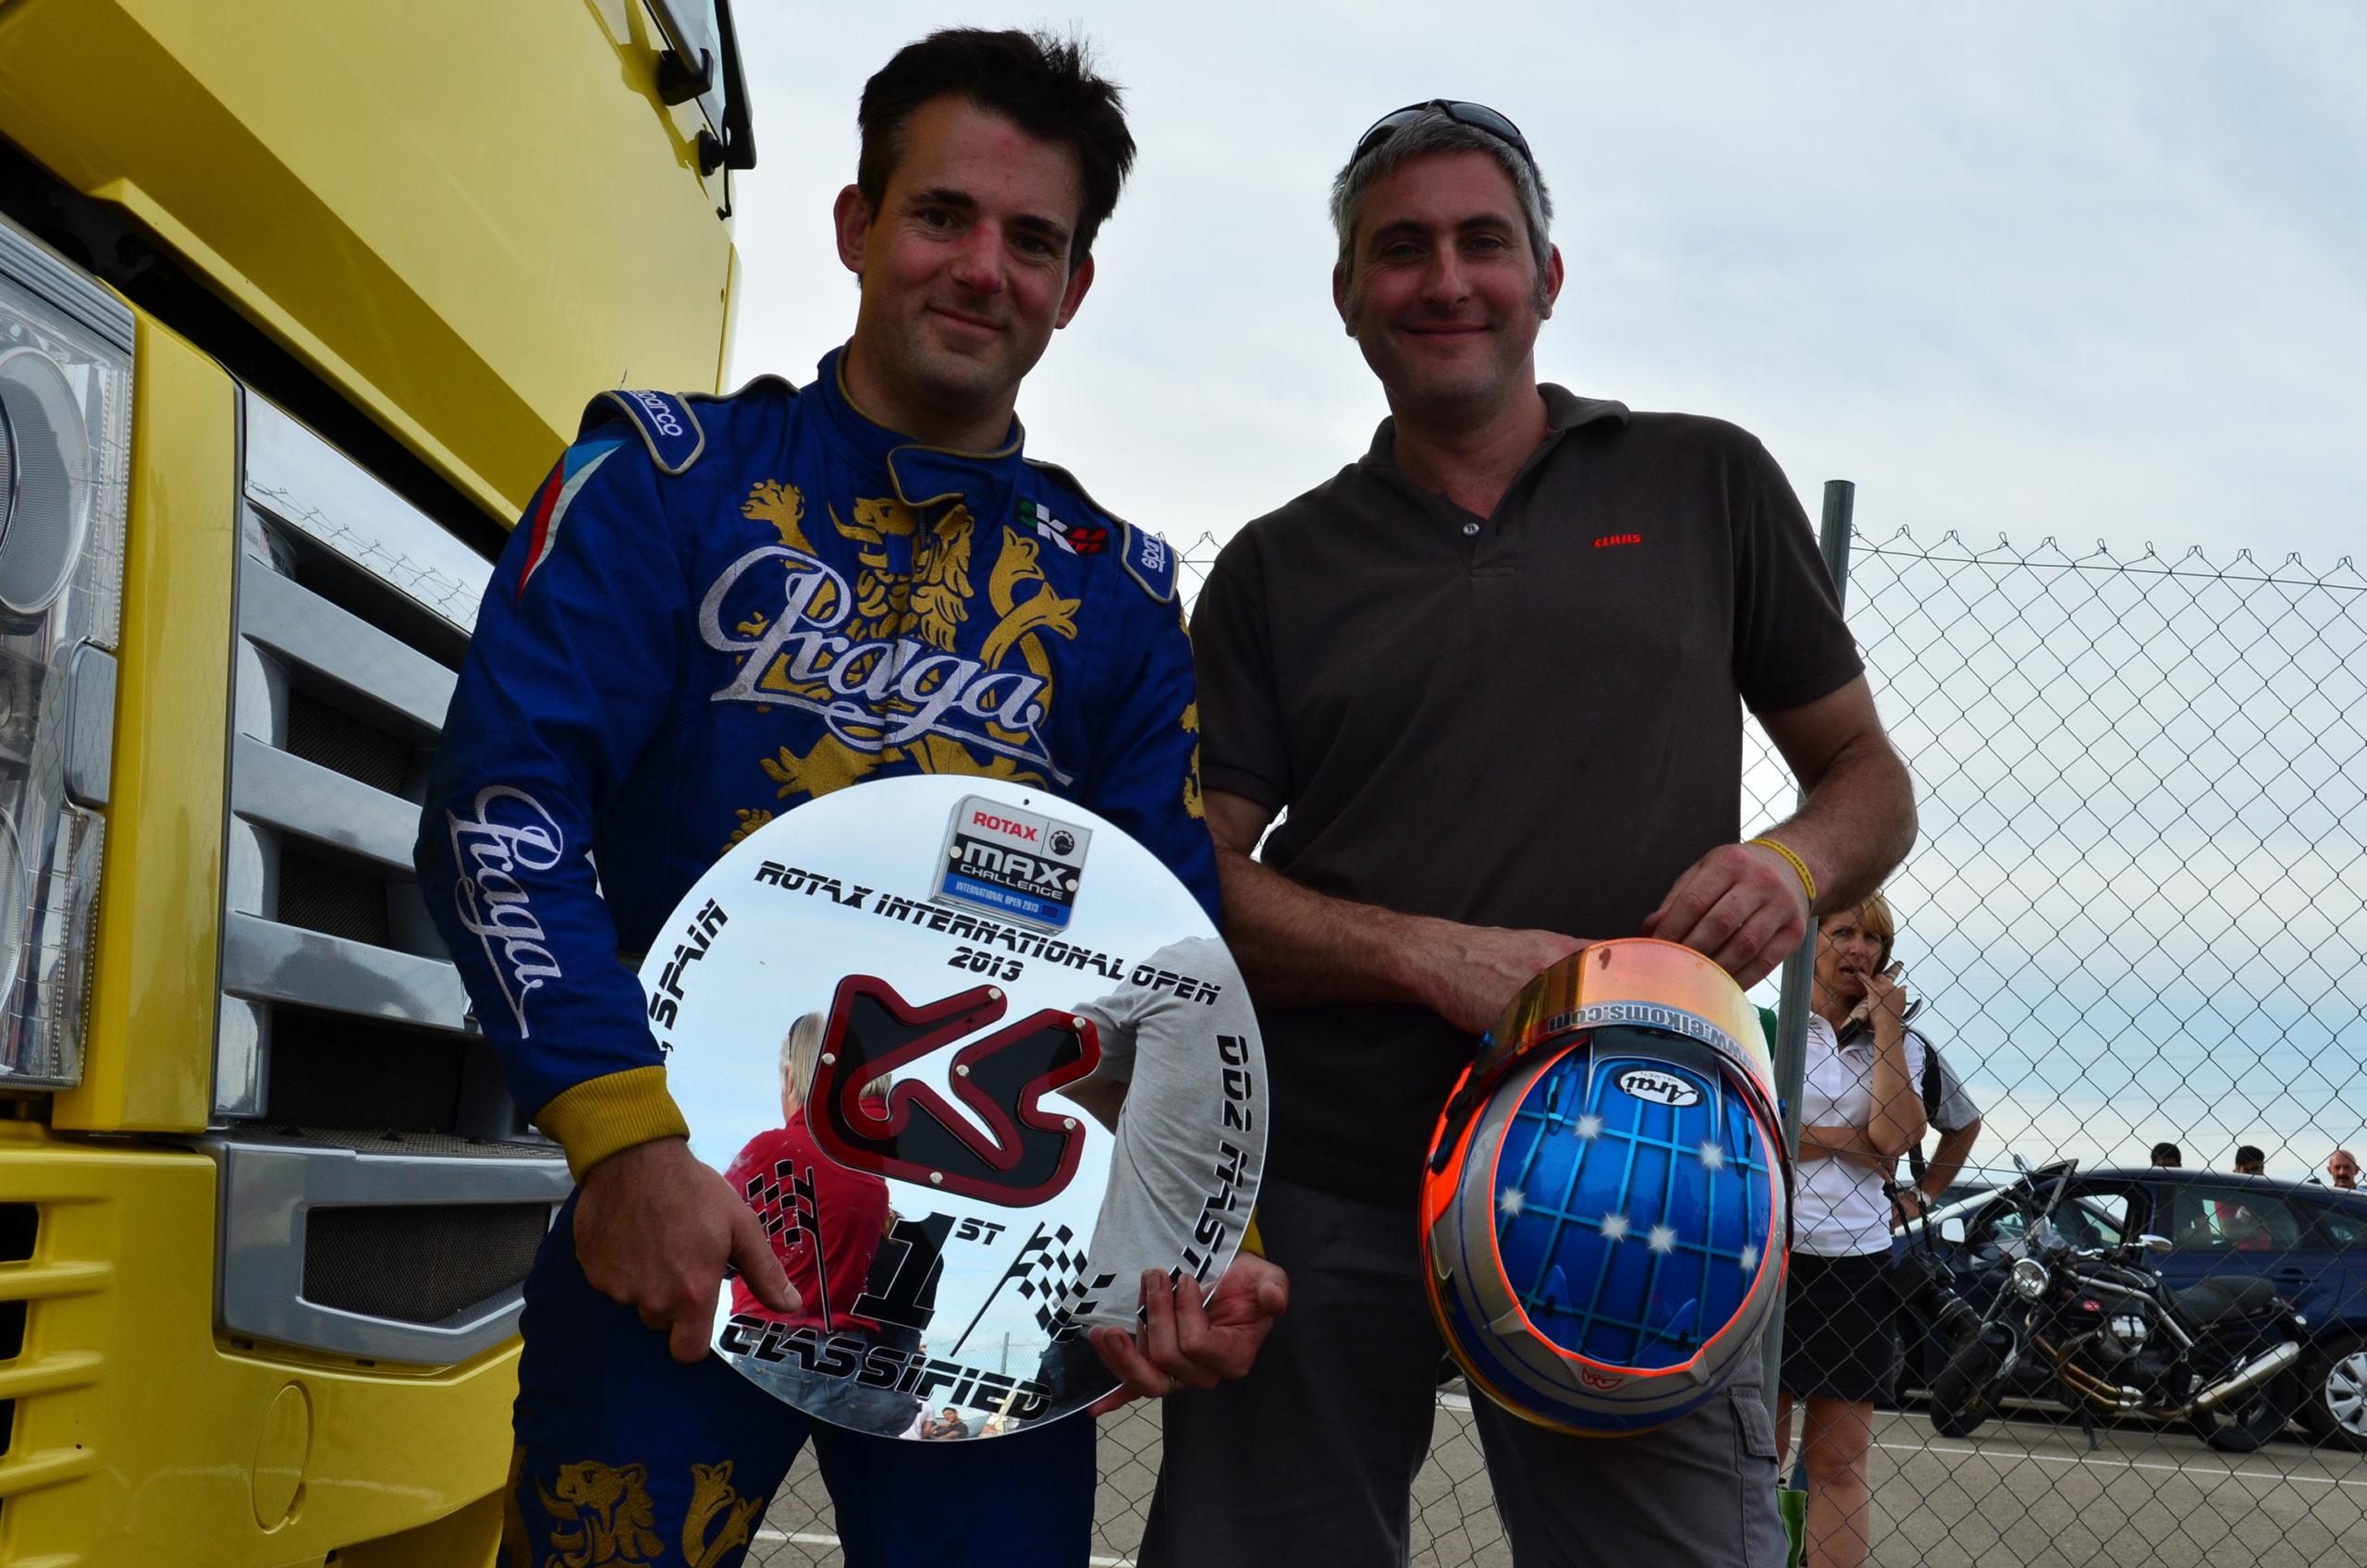 Praga wins DD2 Masters at Rotax Int. Open Zuera 2013